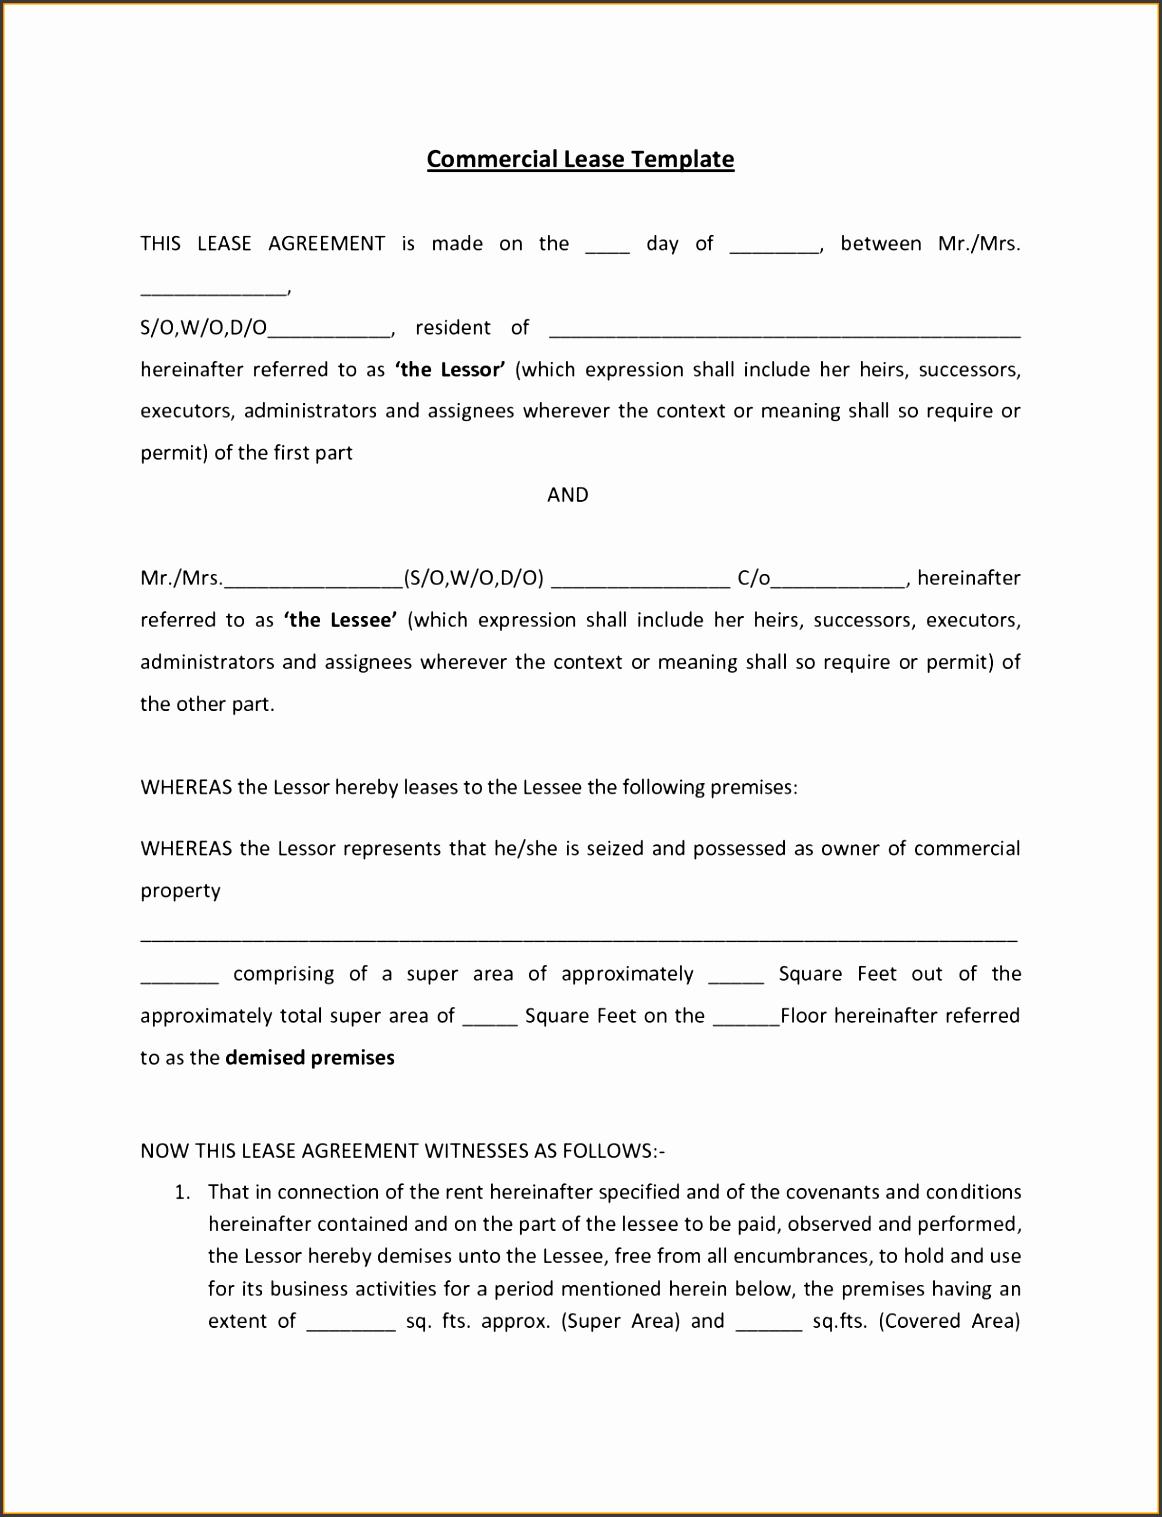 rental agreement invoicee rent bill sample freewordtemplates vehicle rental agreement invoice monthly blank short term avis